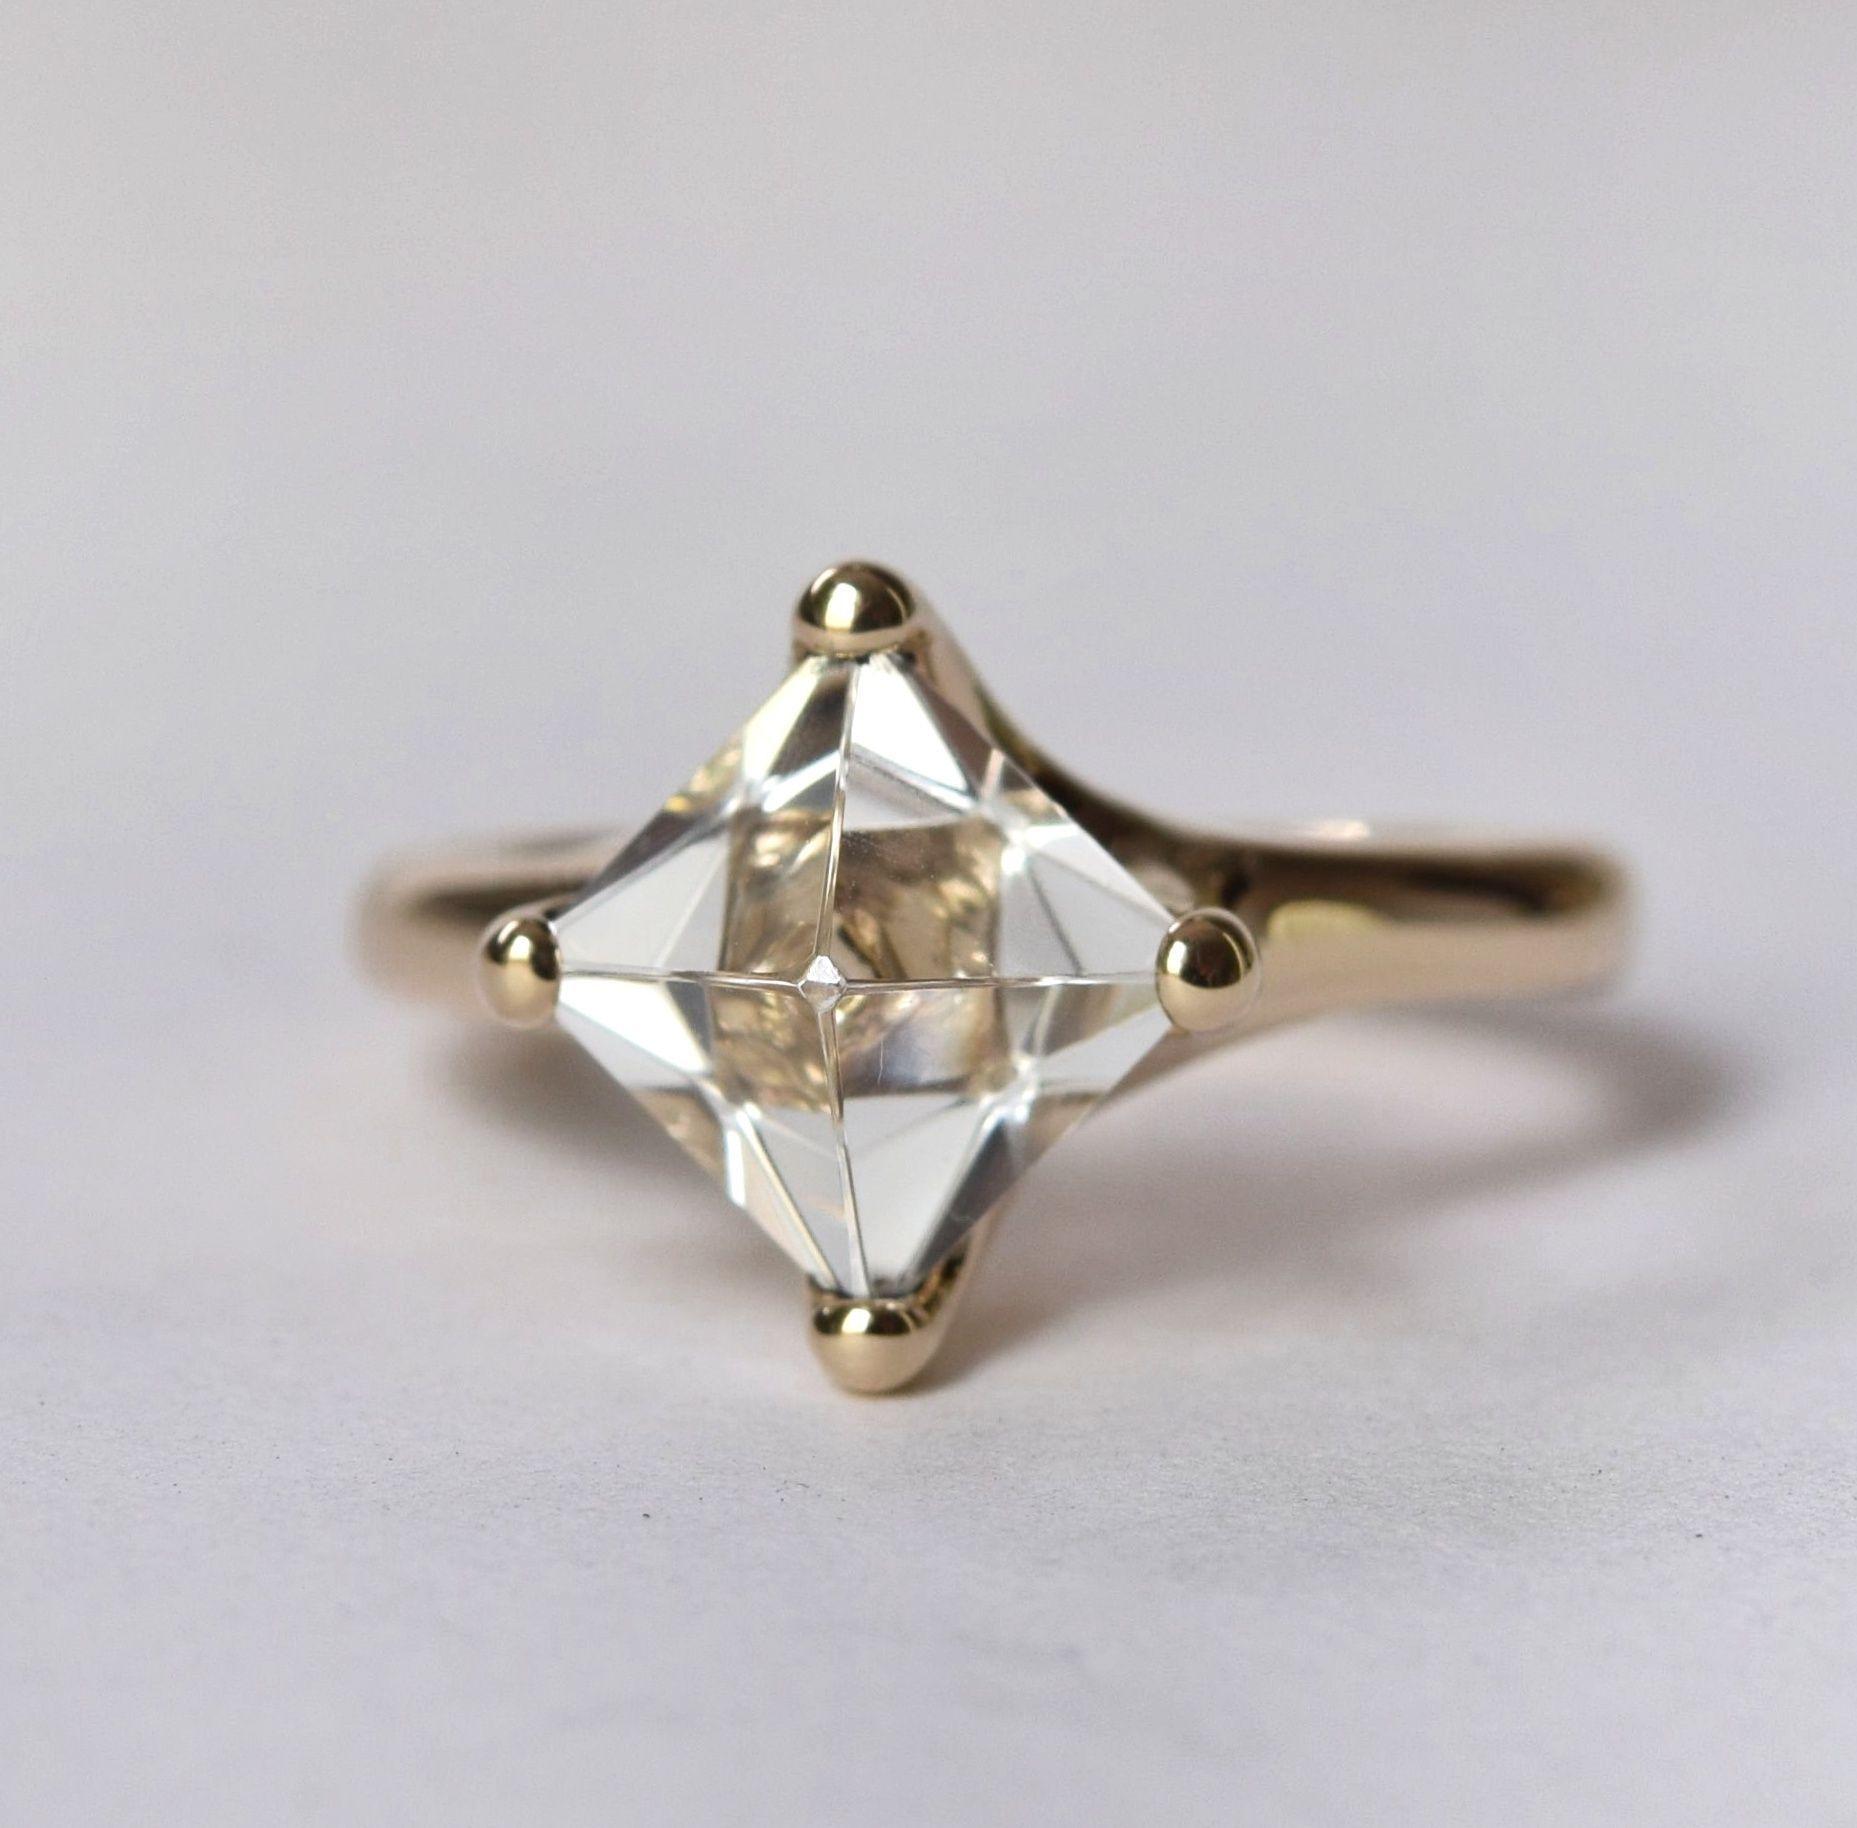 S Yamane Studio Custom Custom Cut Octahedron Topaz Ring